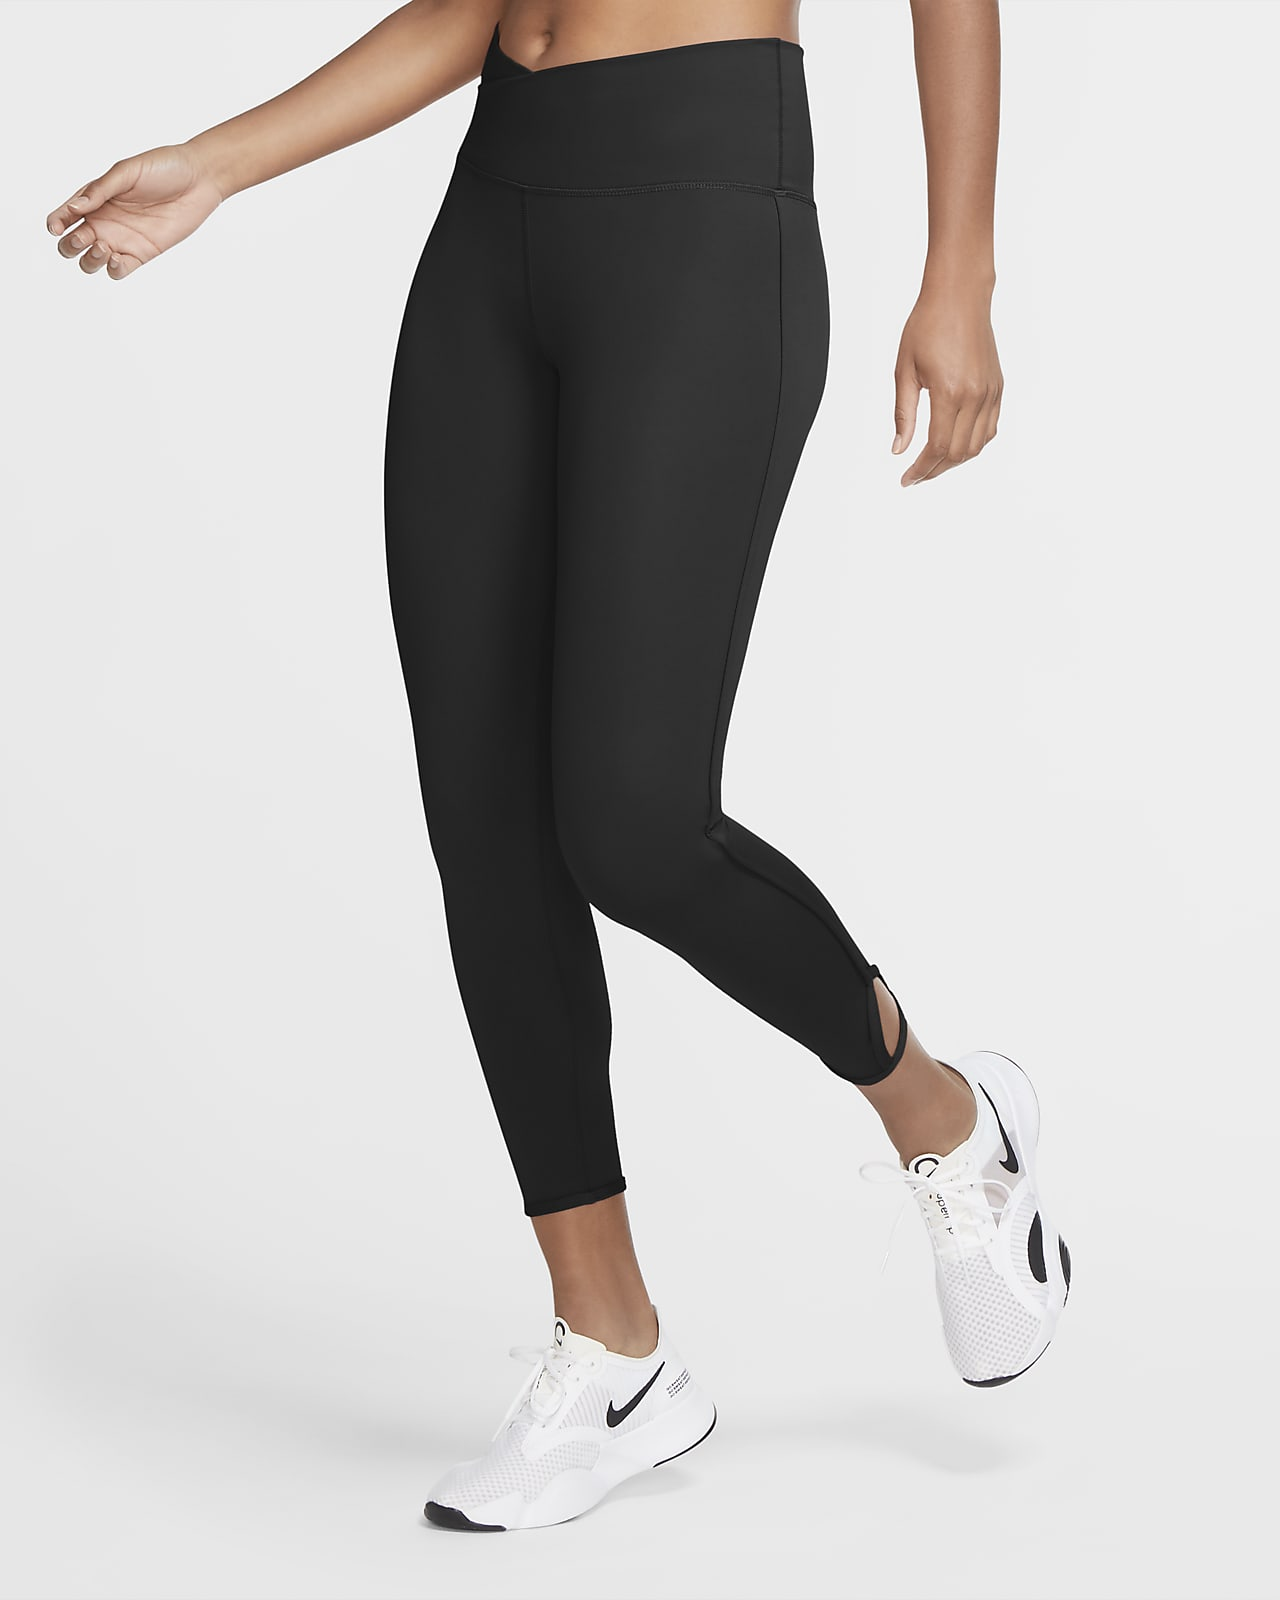 Nike Yoga Women's 7/8 Cutout Leggings